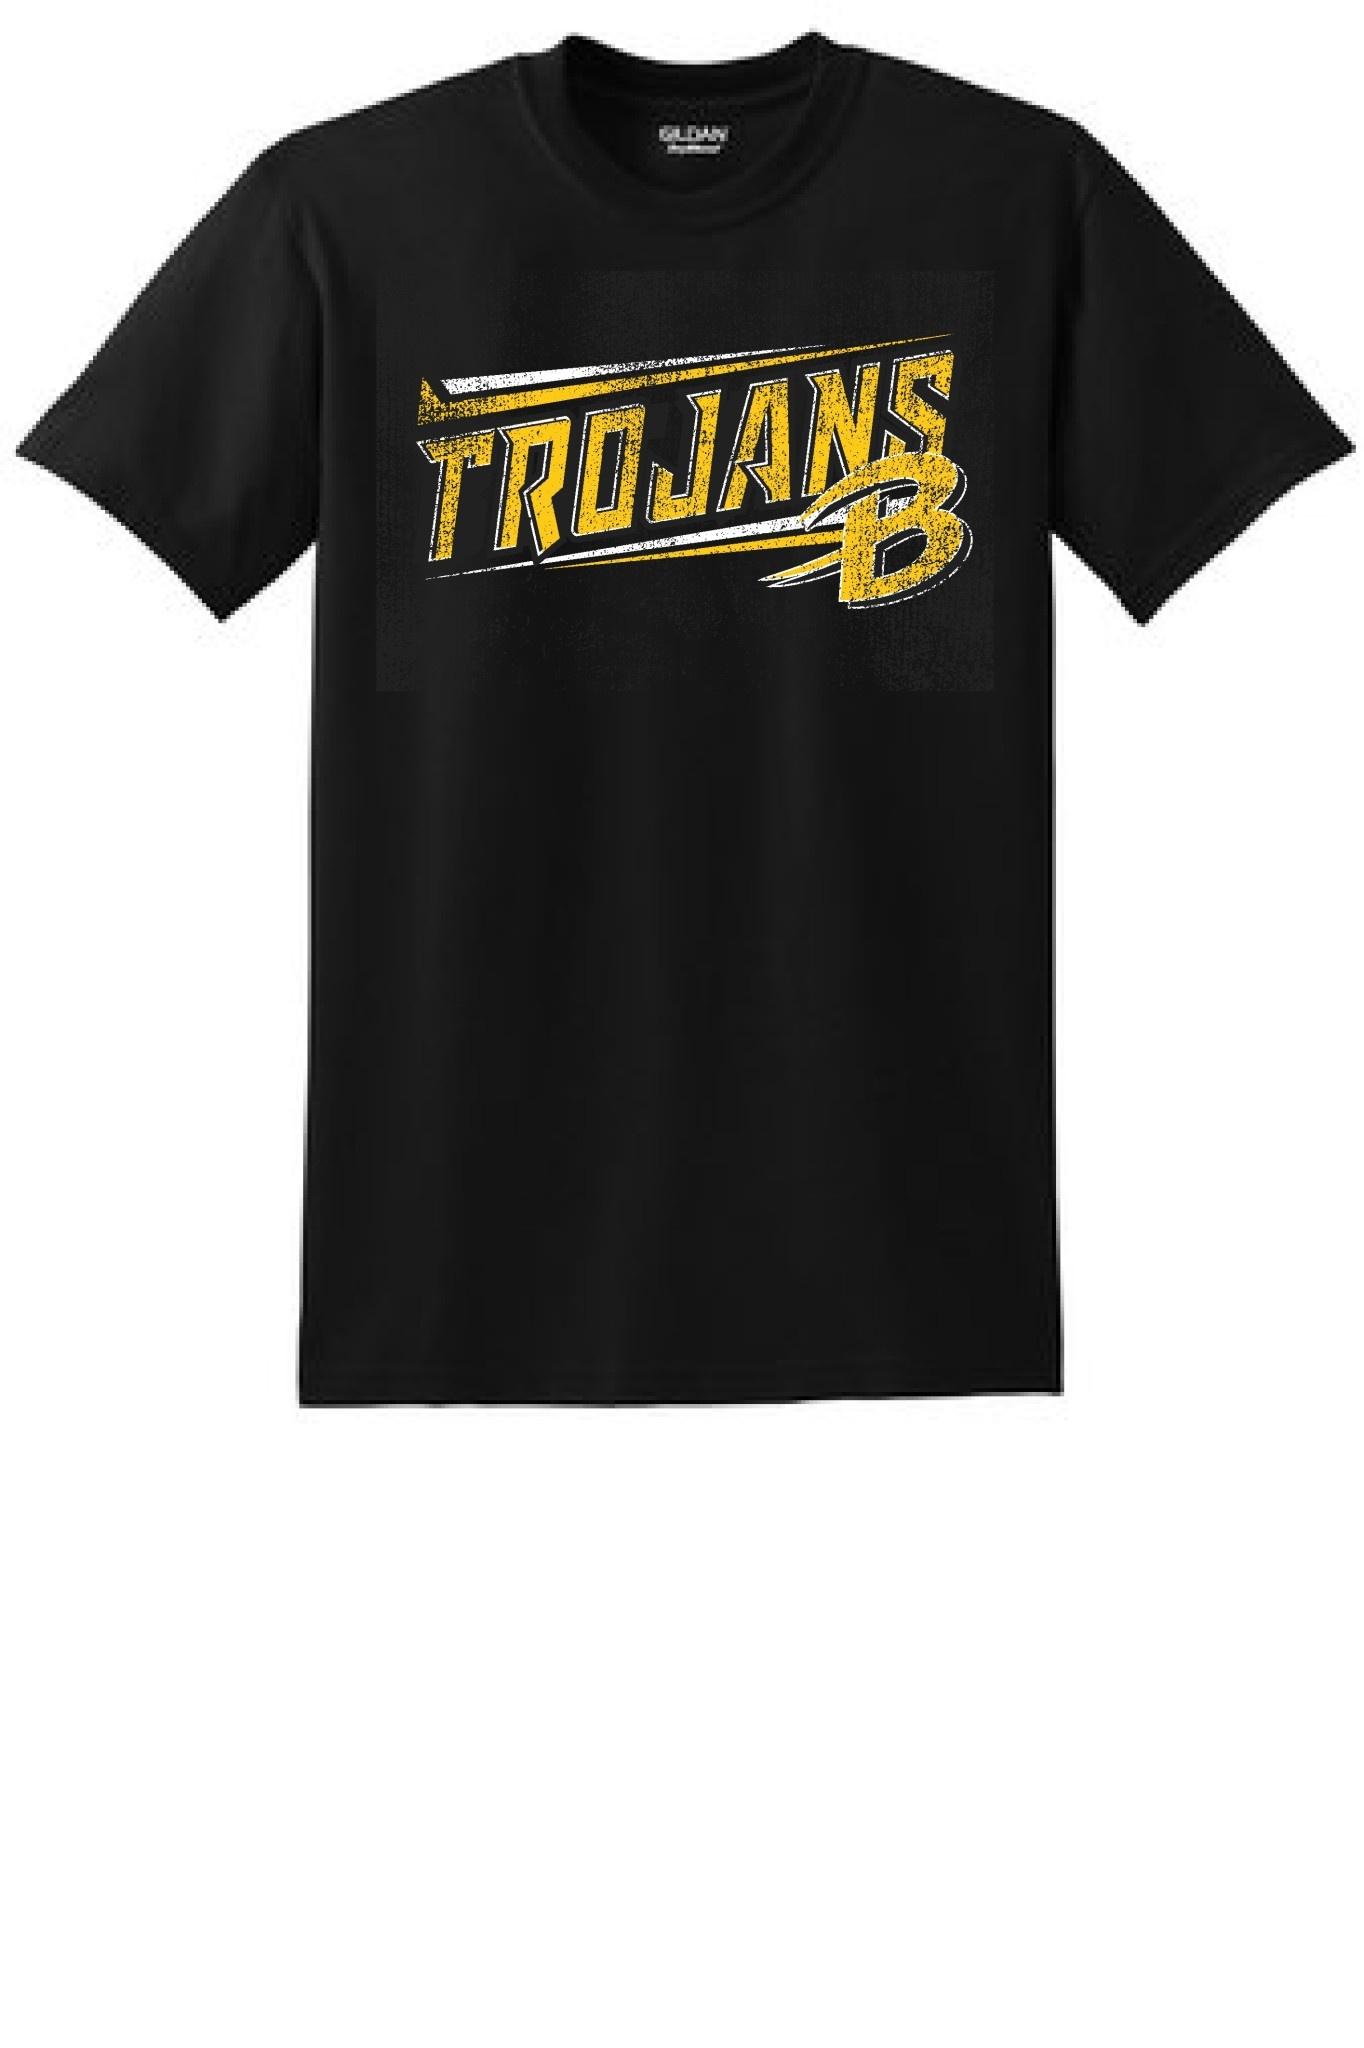 B222-8000 Gildan 50/50 T-shirt